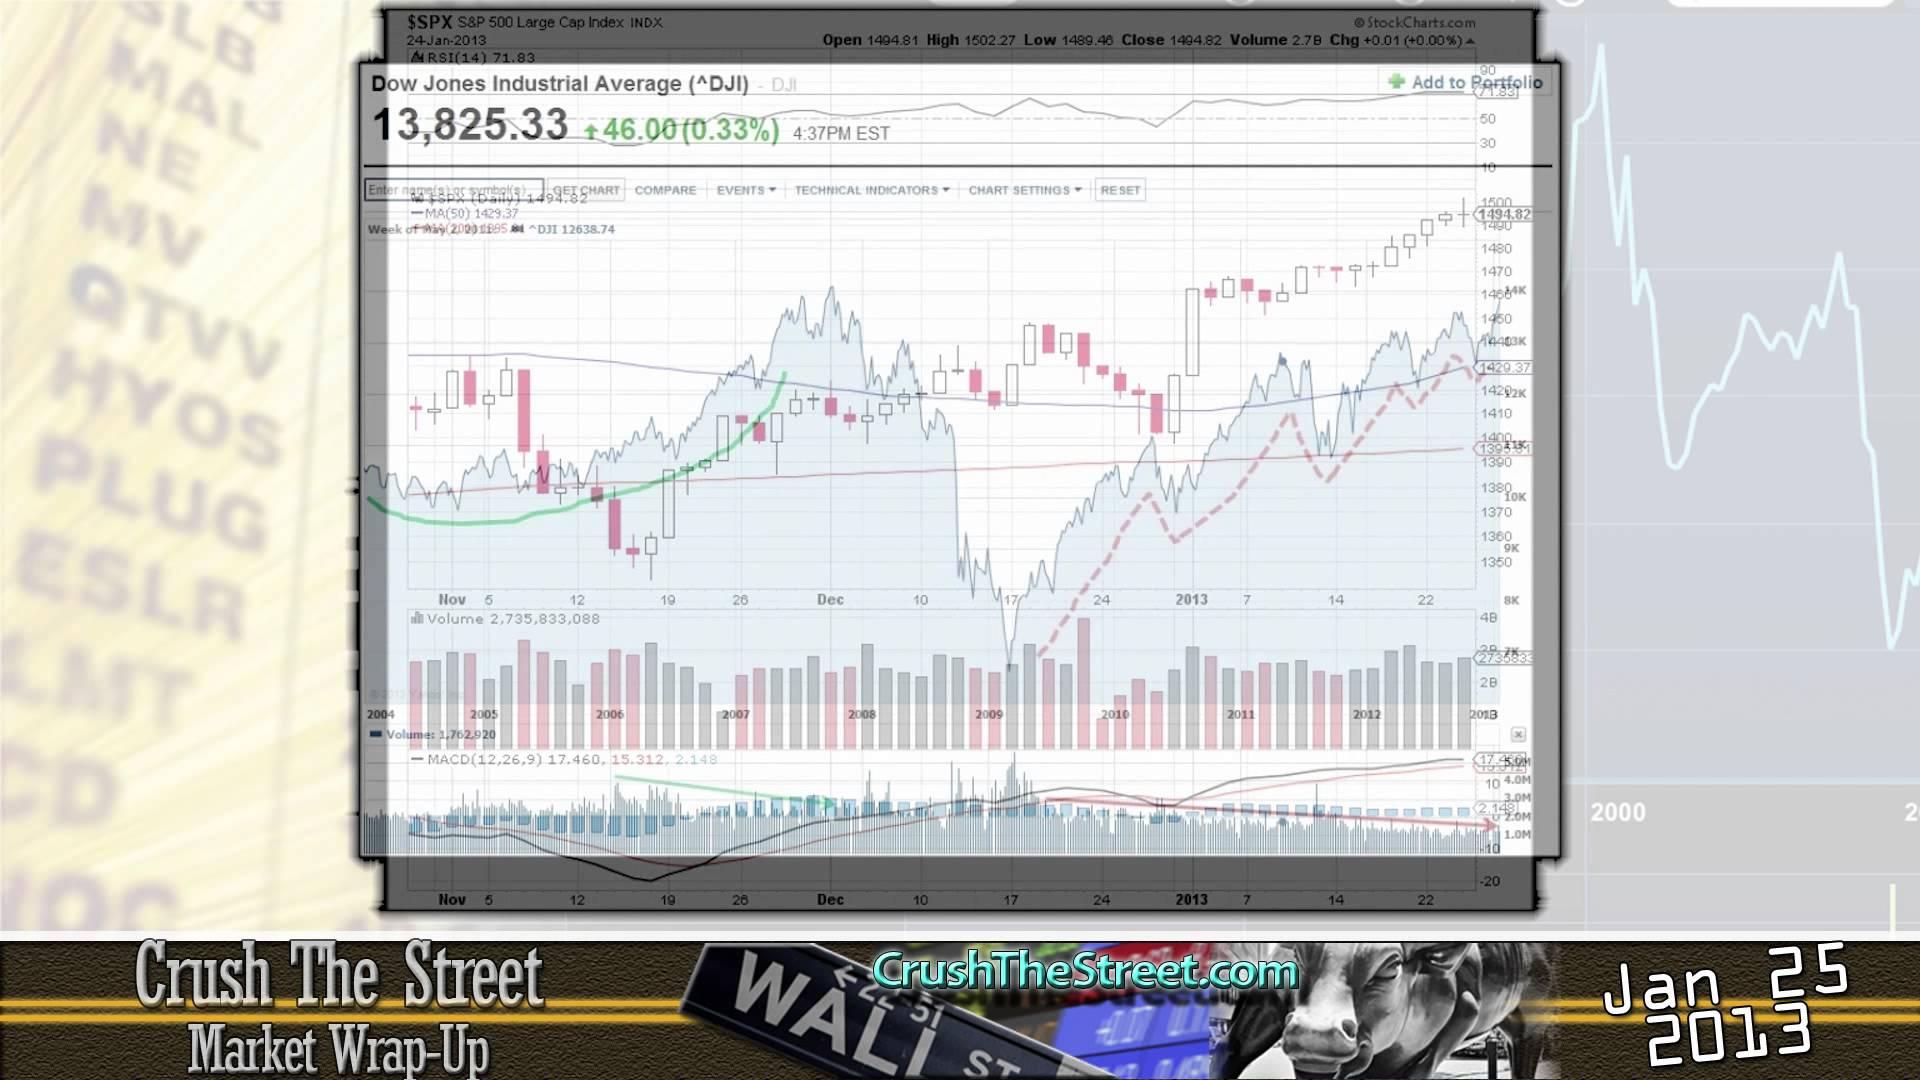 Market Wrap-Up Jan 25 2013